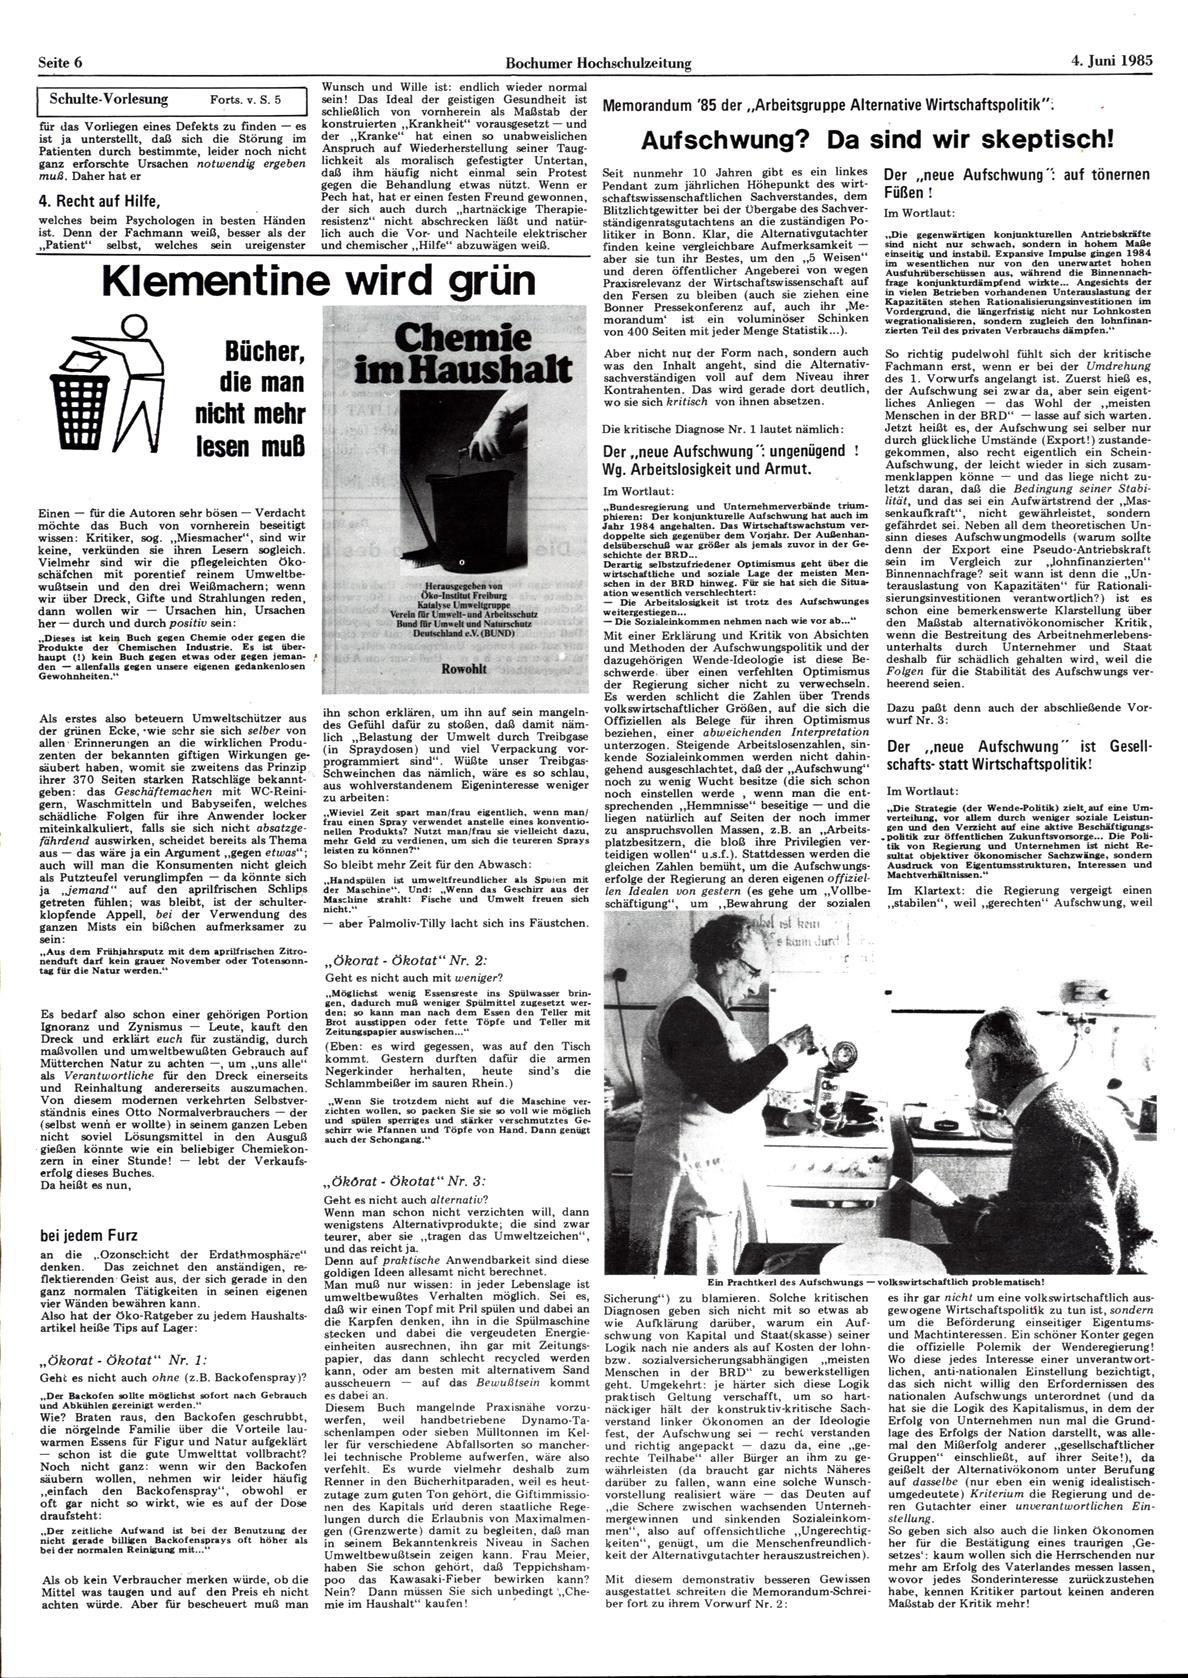 Bochum_BHZ_19850604_111_006